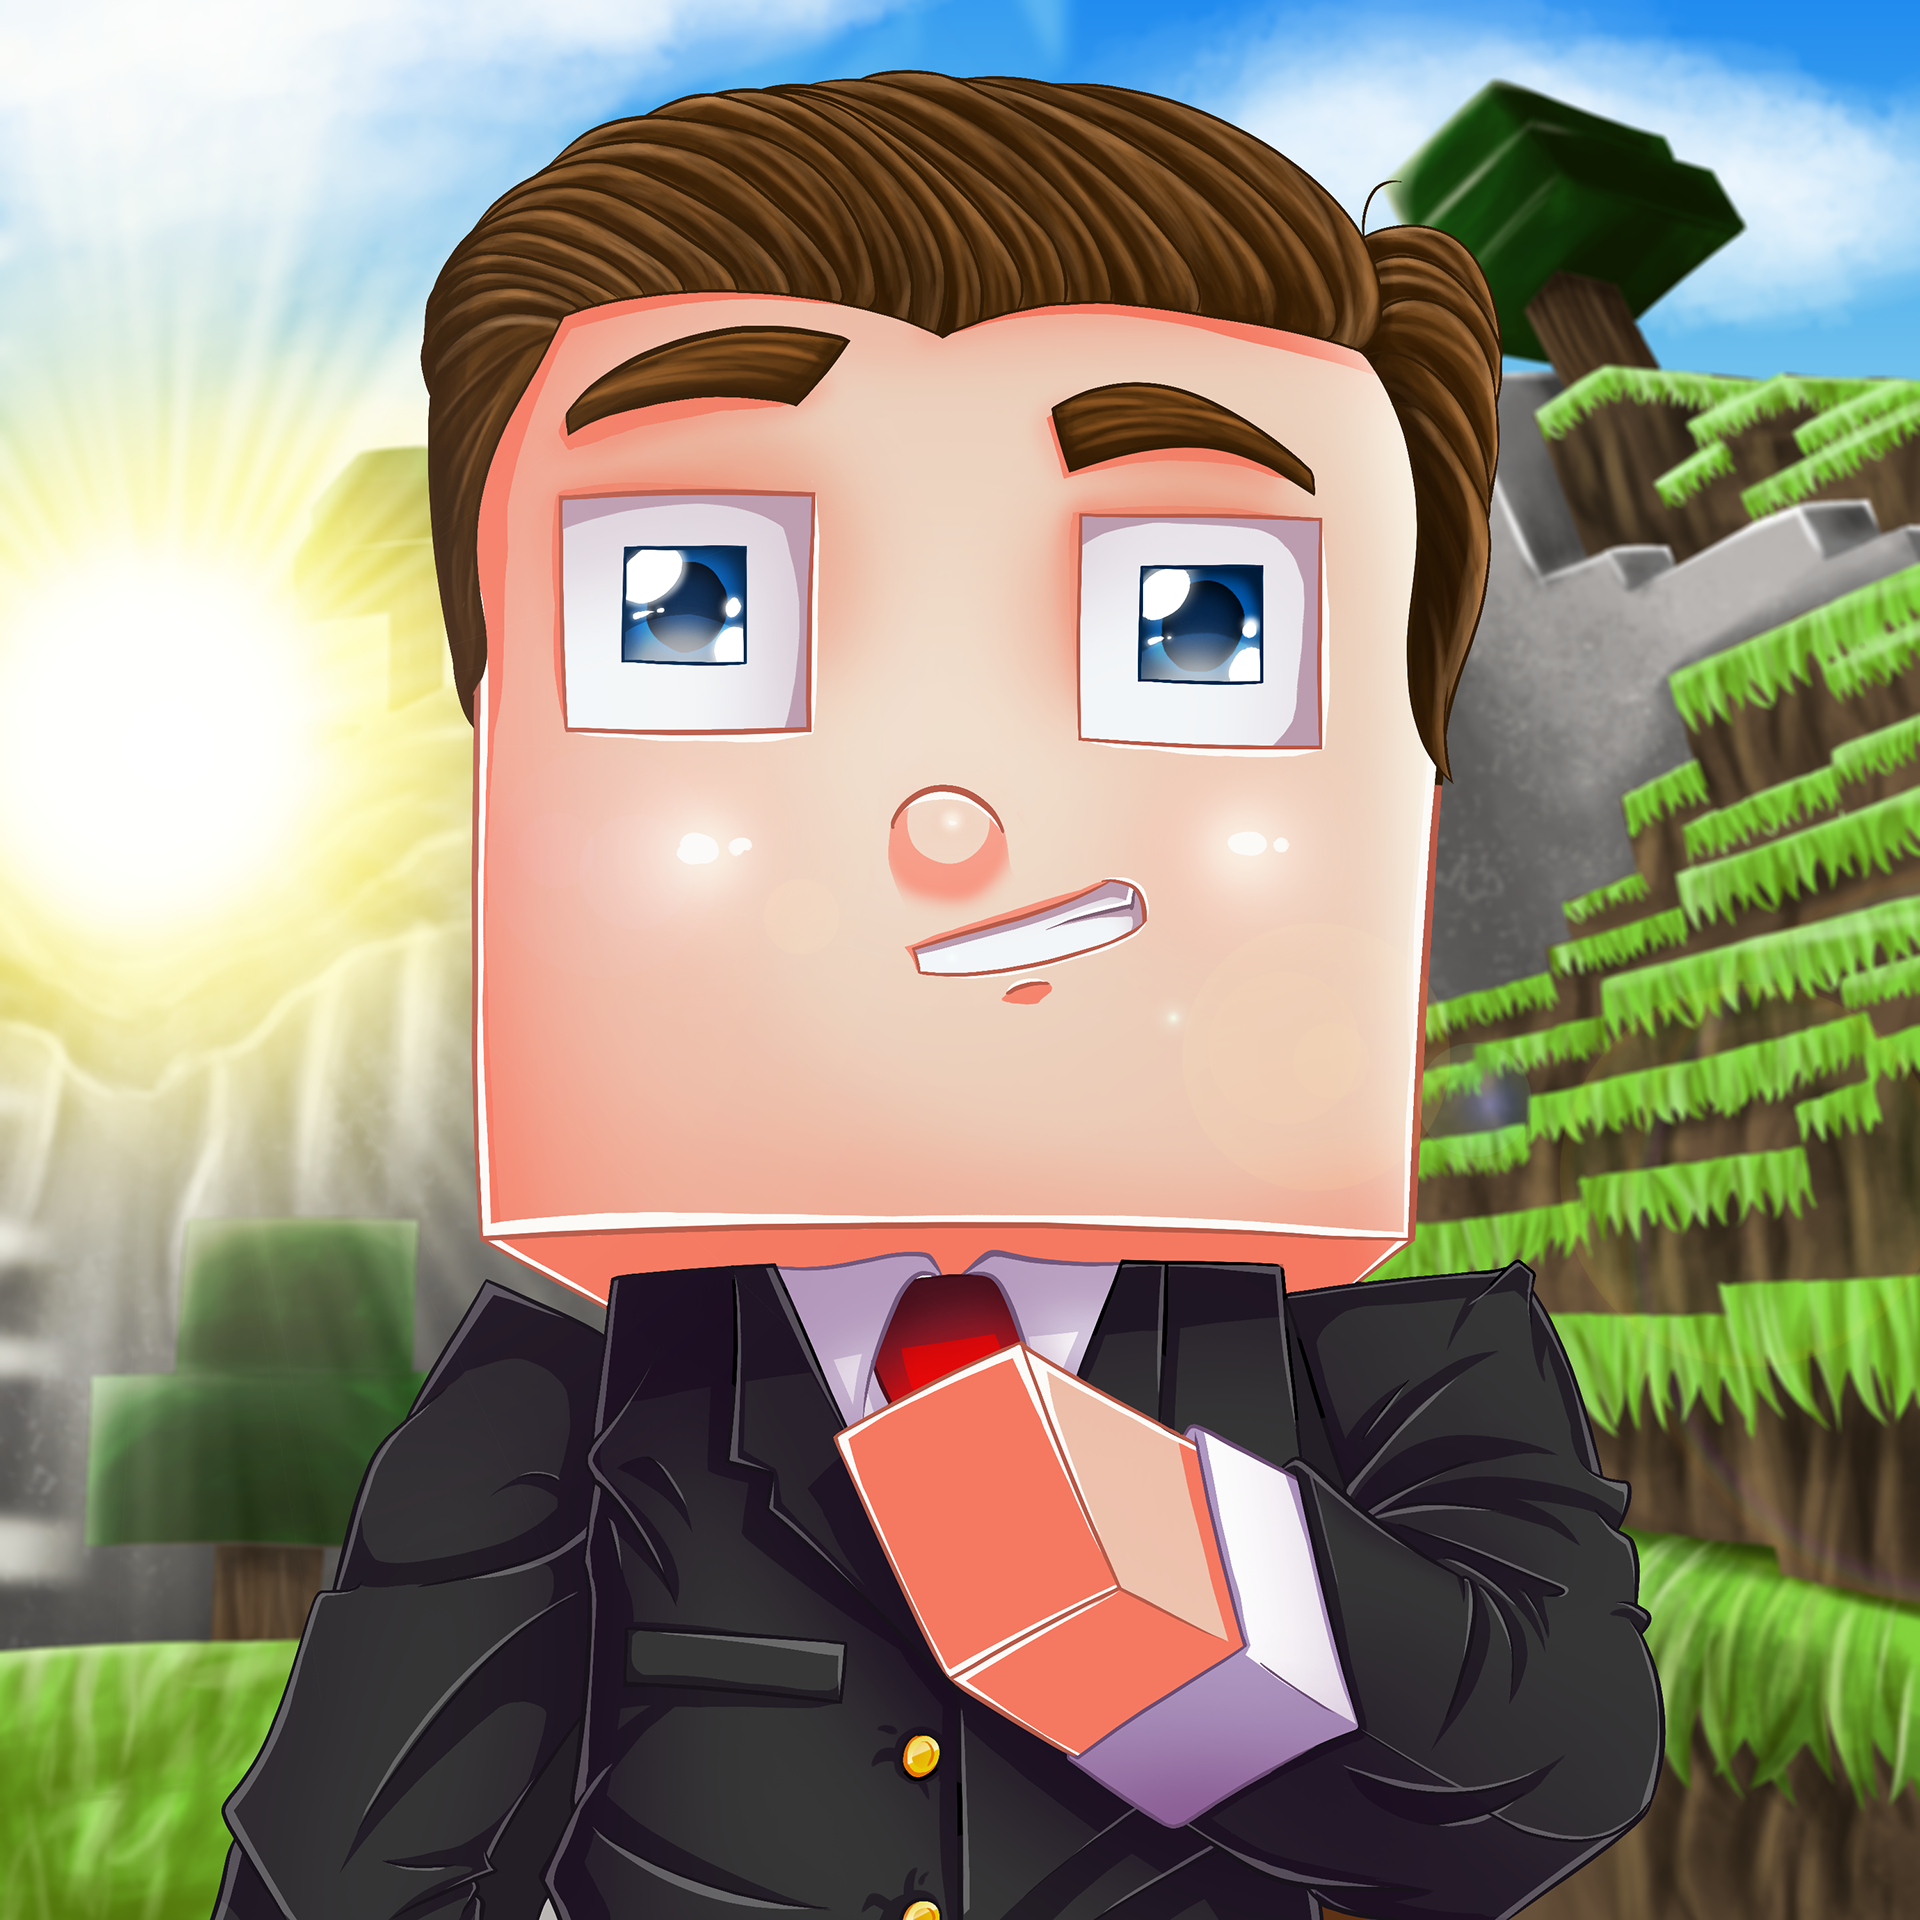 аватарка майнкрафт 250 пикселей в шерину #1